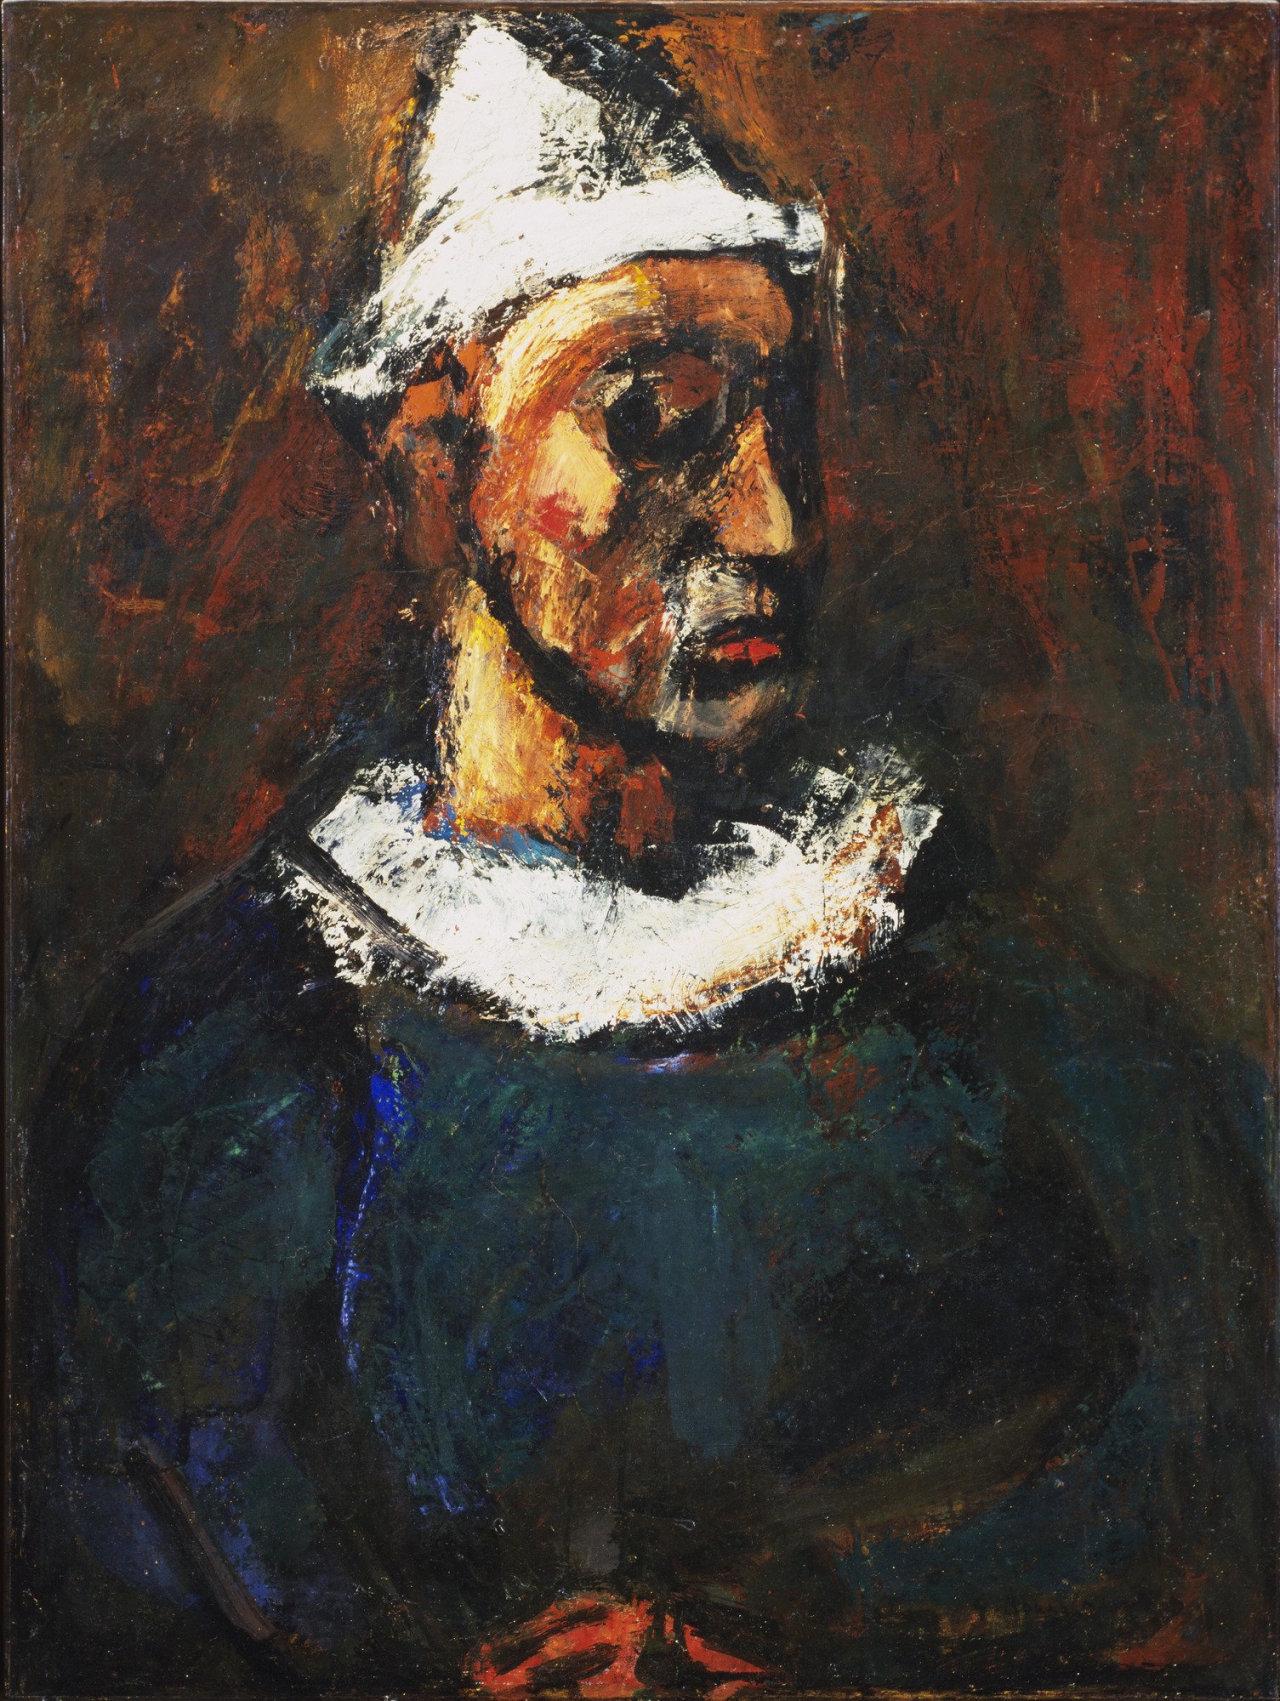 herzogtum-sachsen-weissenfels: Georges Rouault (French, 1871-1958), Clown, 1912. Oil on canvas,89.8 x 68.2 cm.